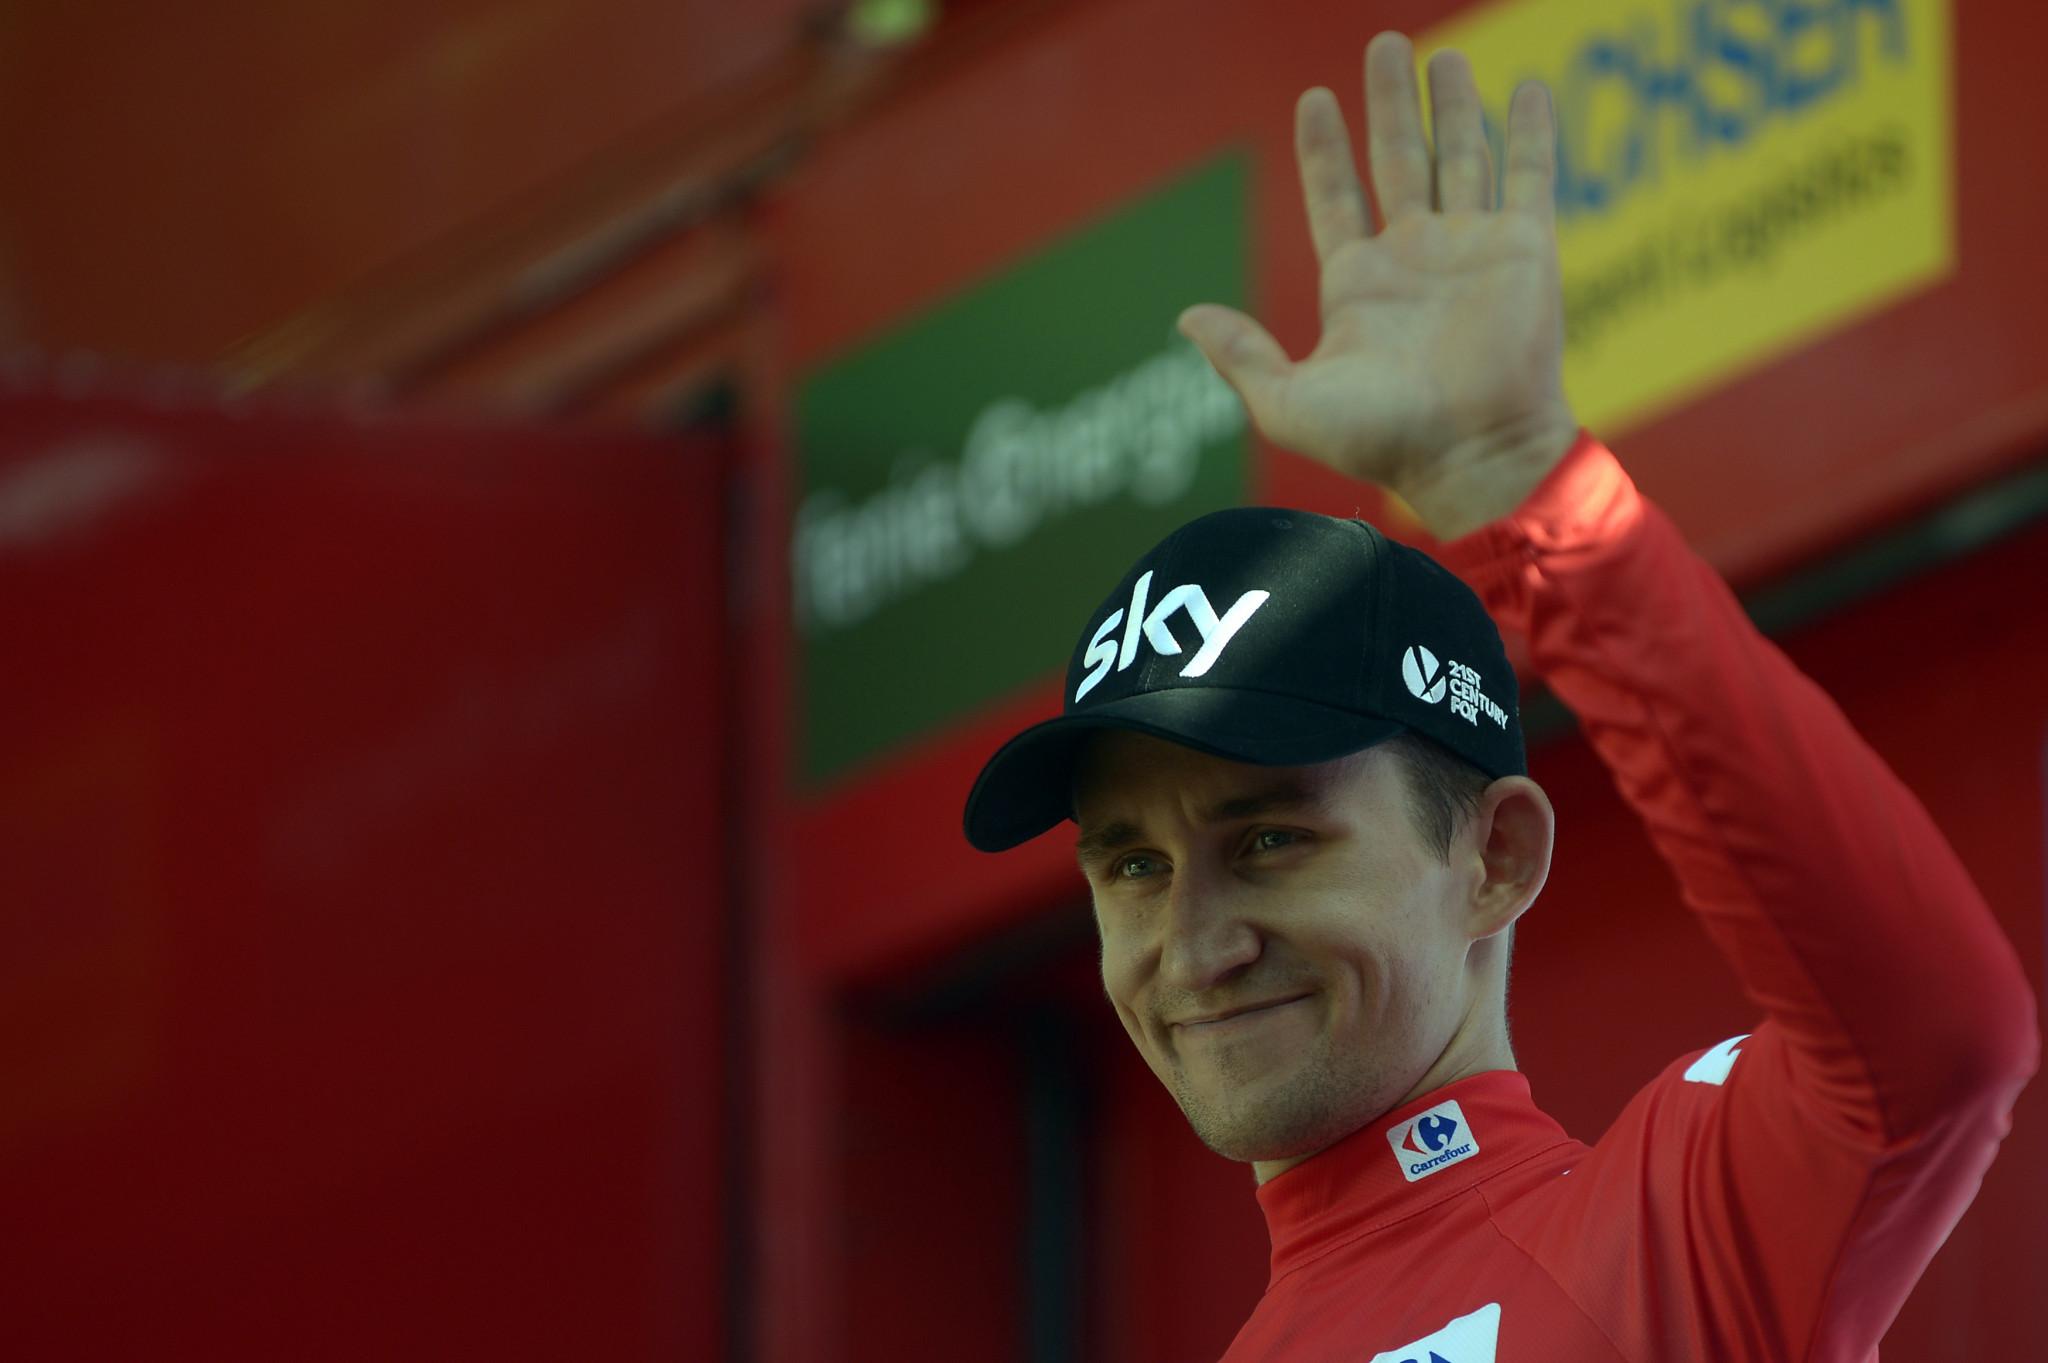 Michal Kwiatkowski saw his race lead cut ©Getty Images